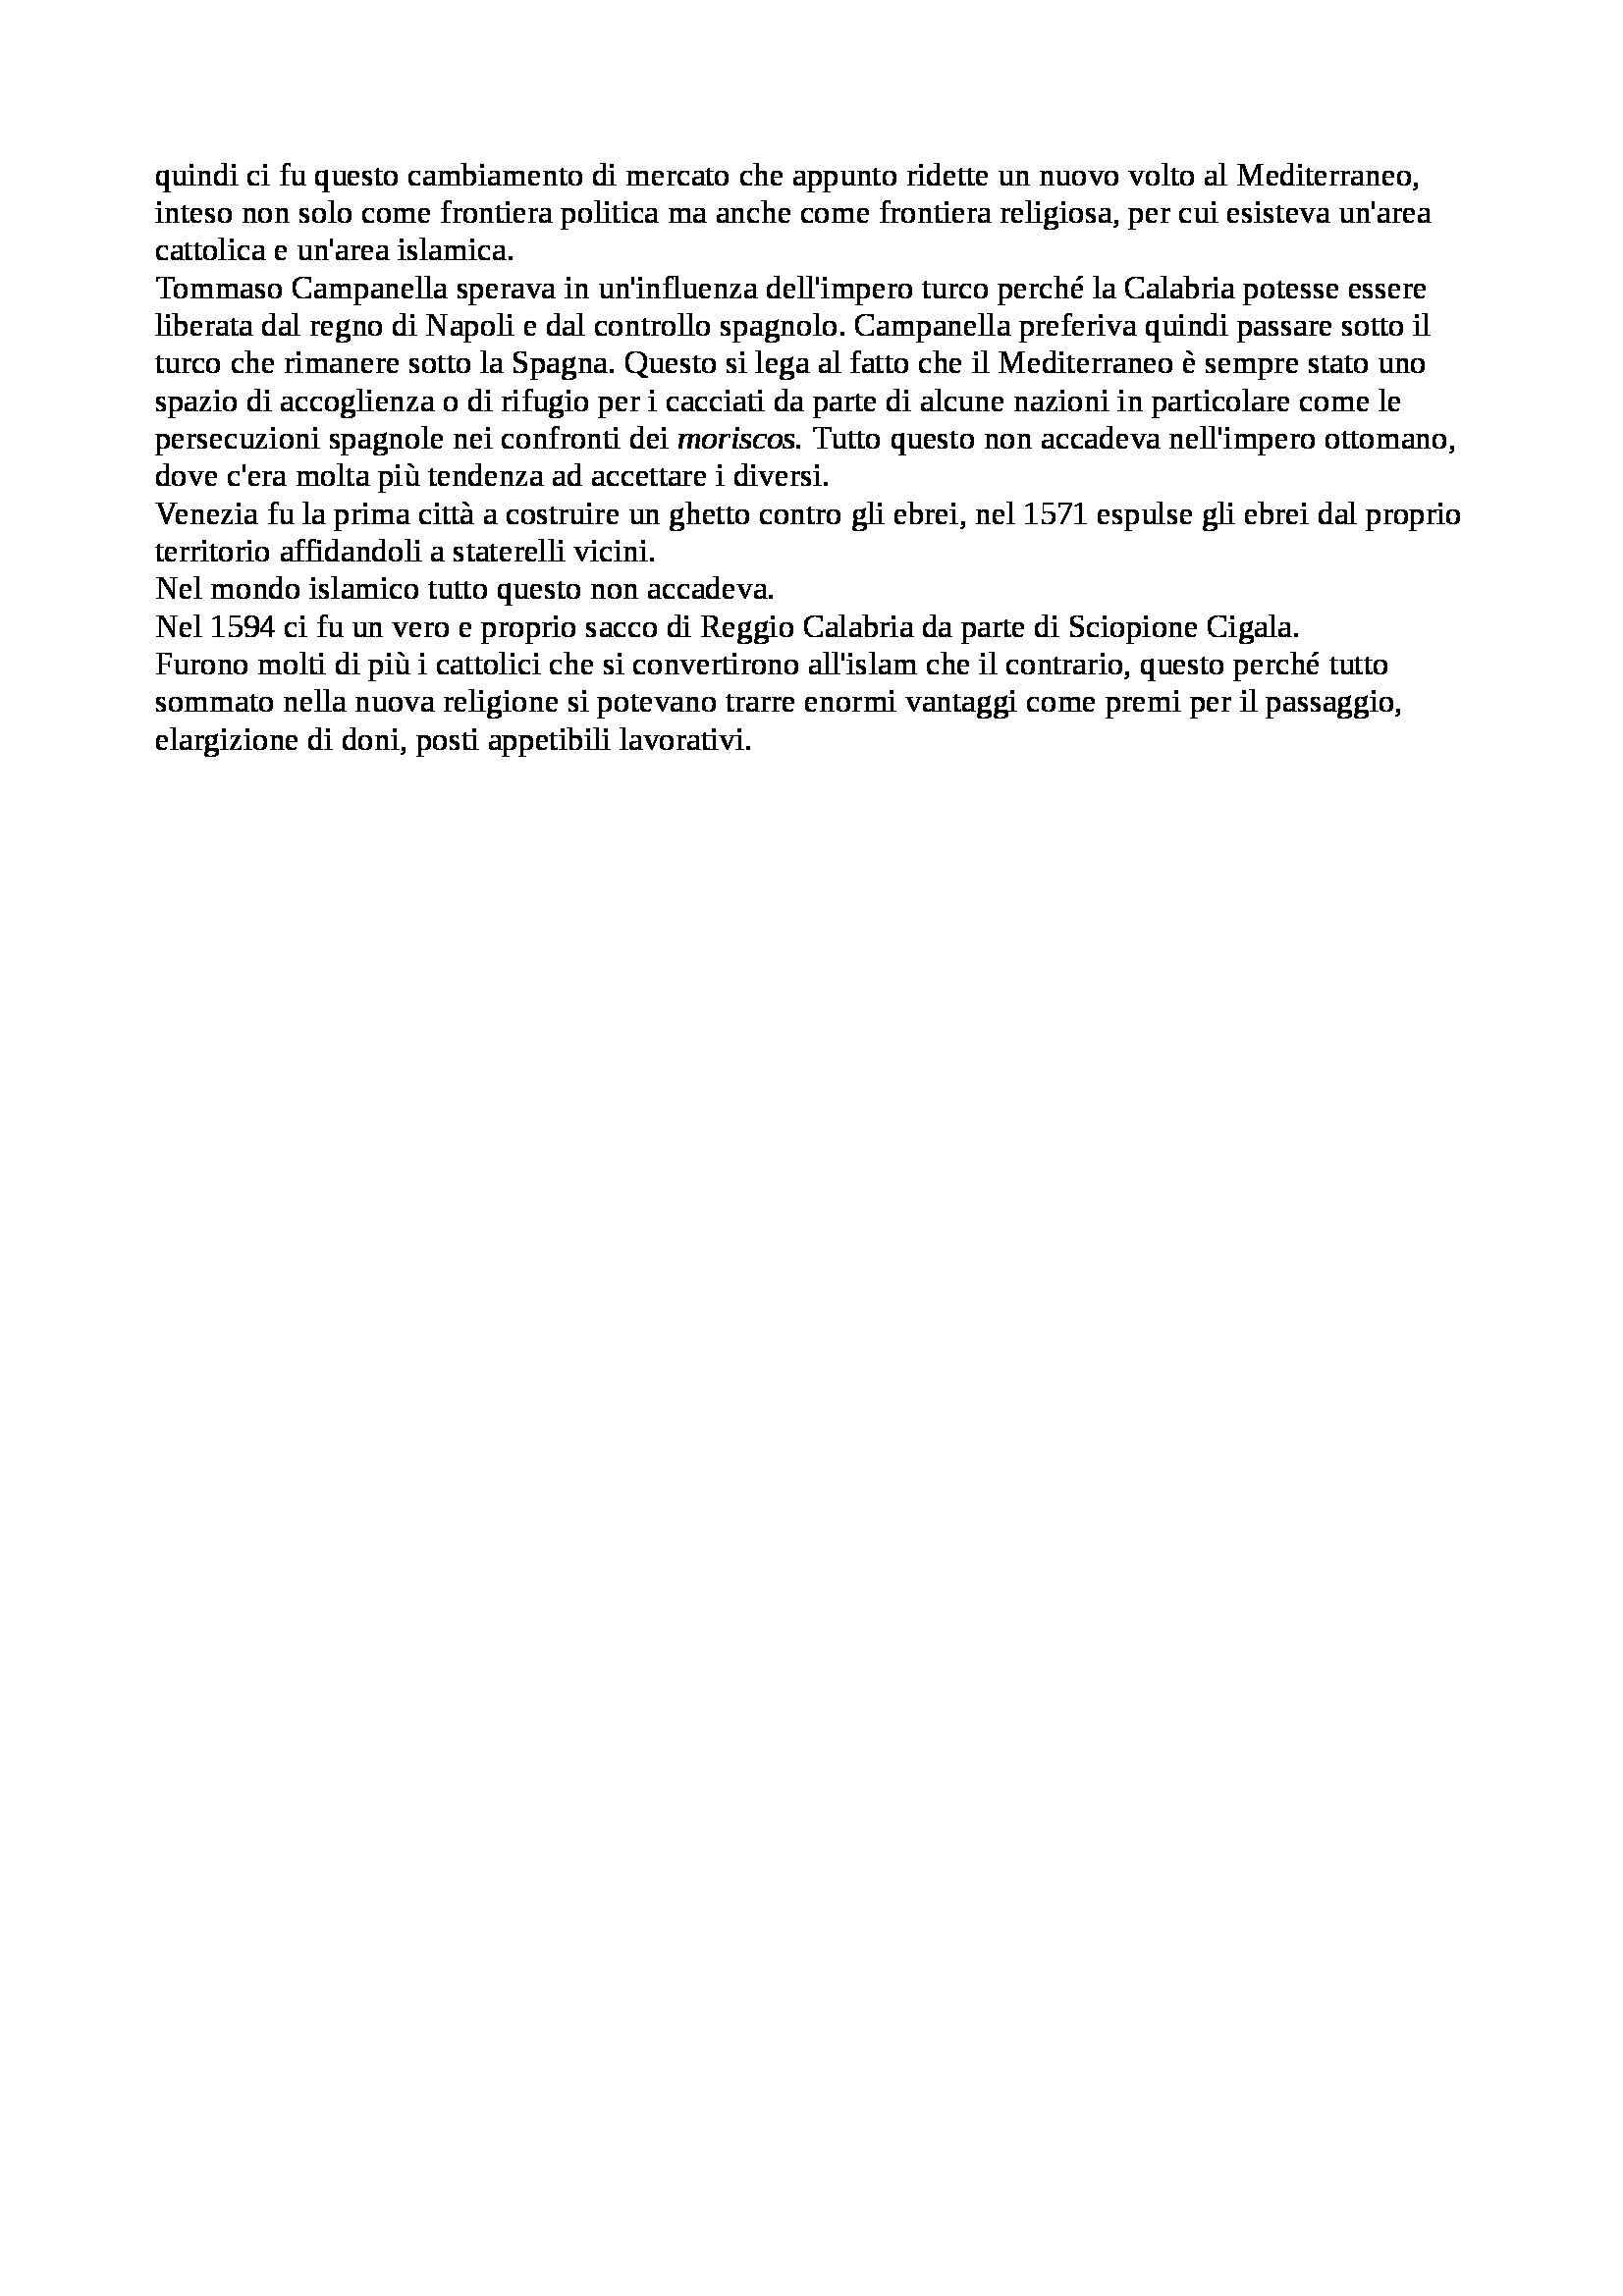 Storia moderna - Appunti lezioni Pag. 16